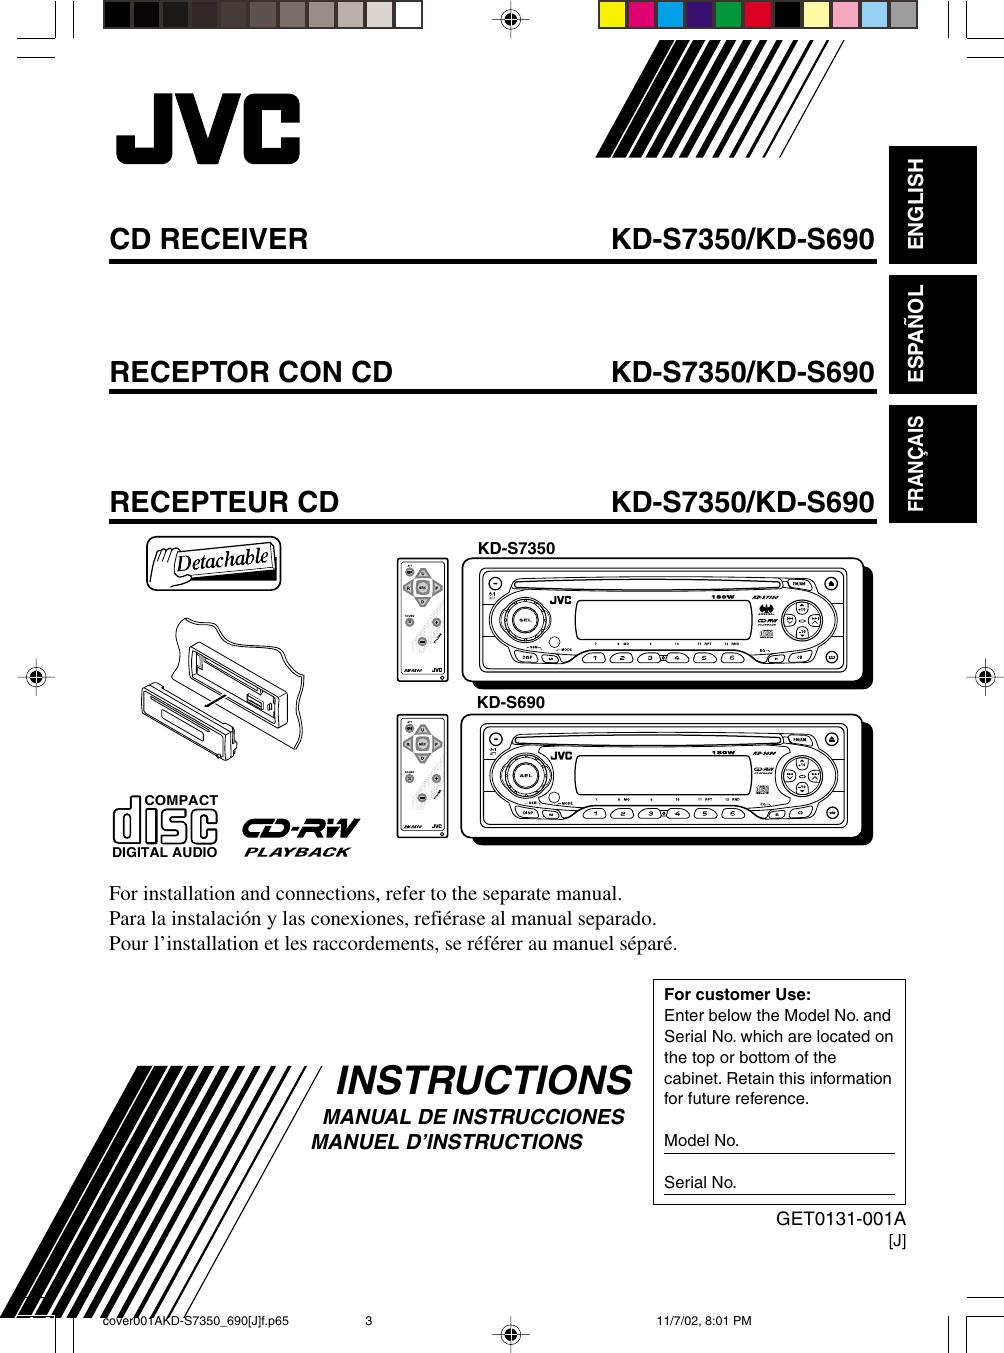 Jvc Kd S690 Users Manual